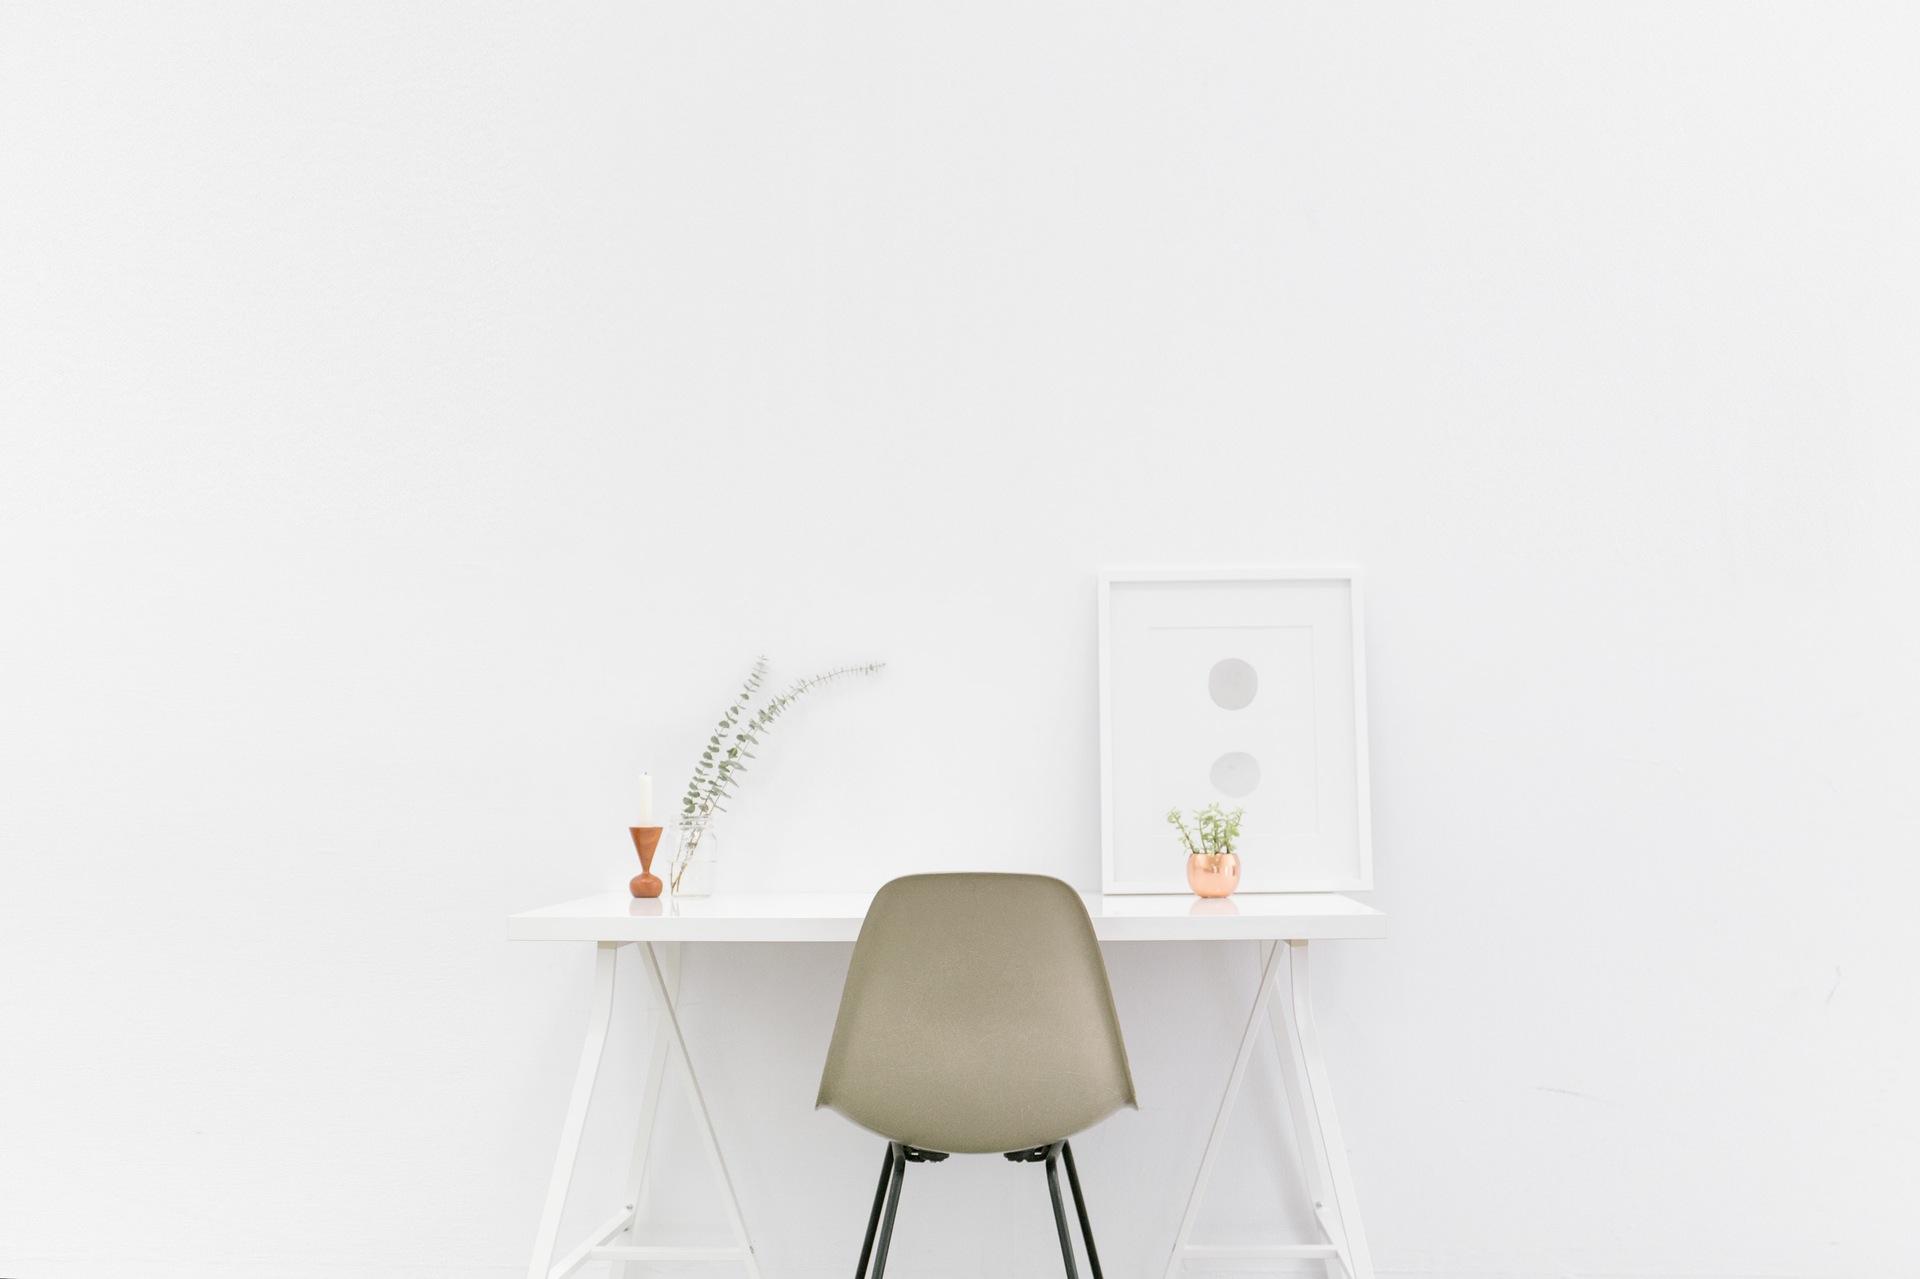 escritorio, habitación, oficina, silla, pared, blanco - Fondos de Pantalla HD - professor-falken.com